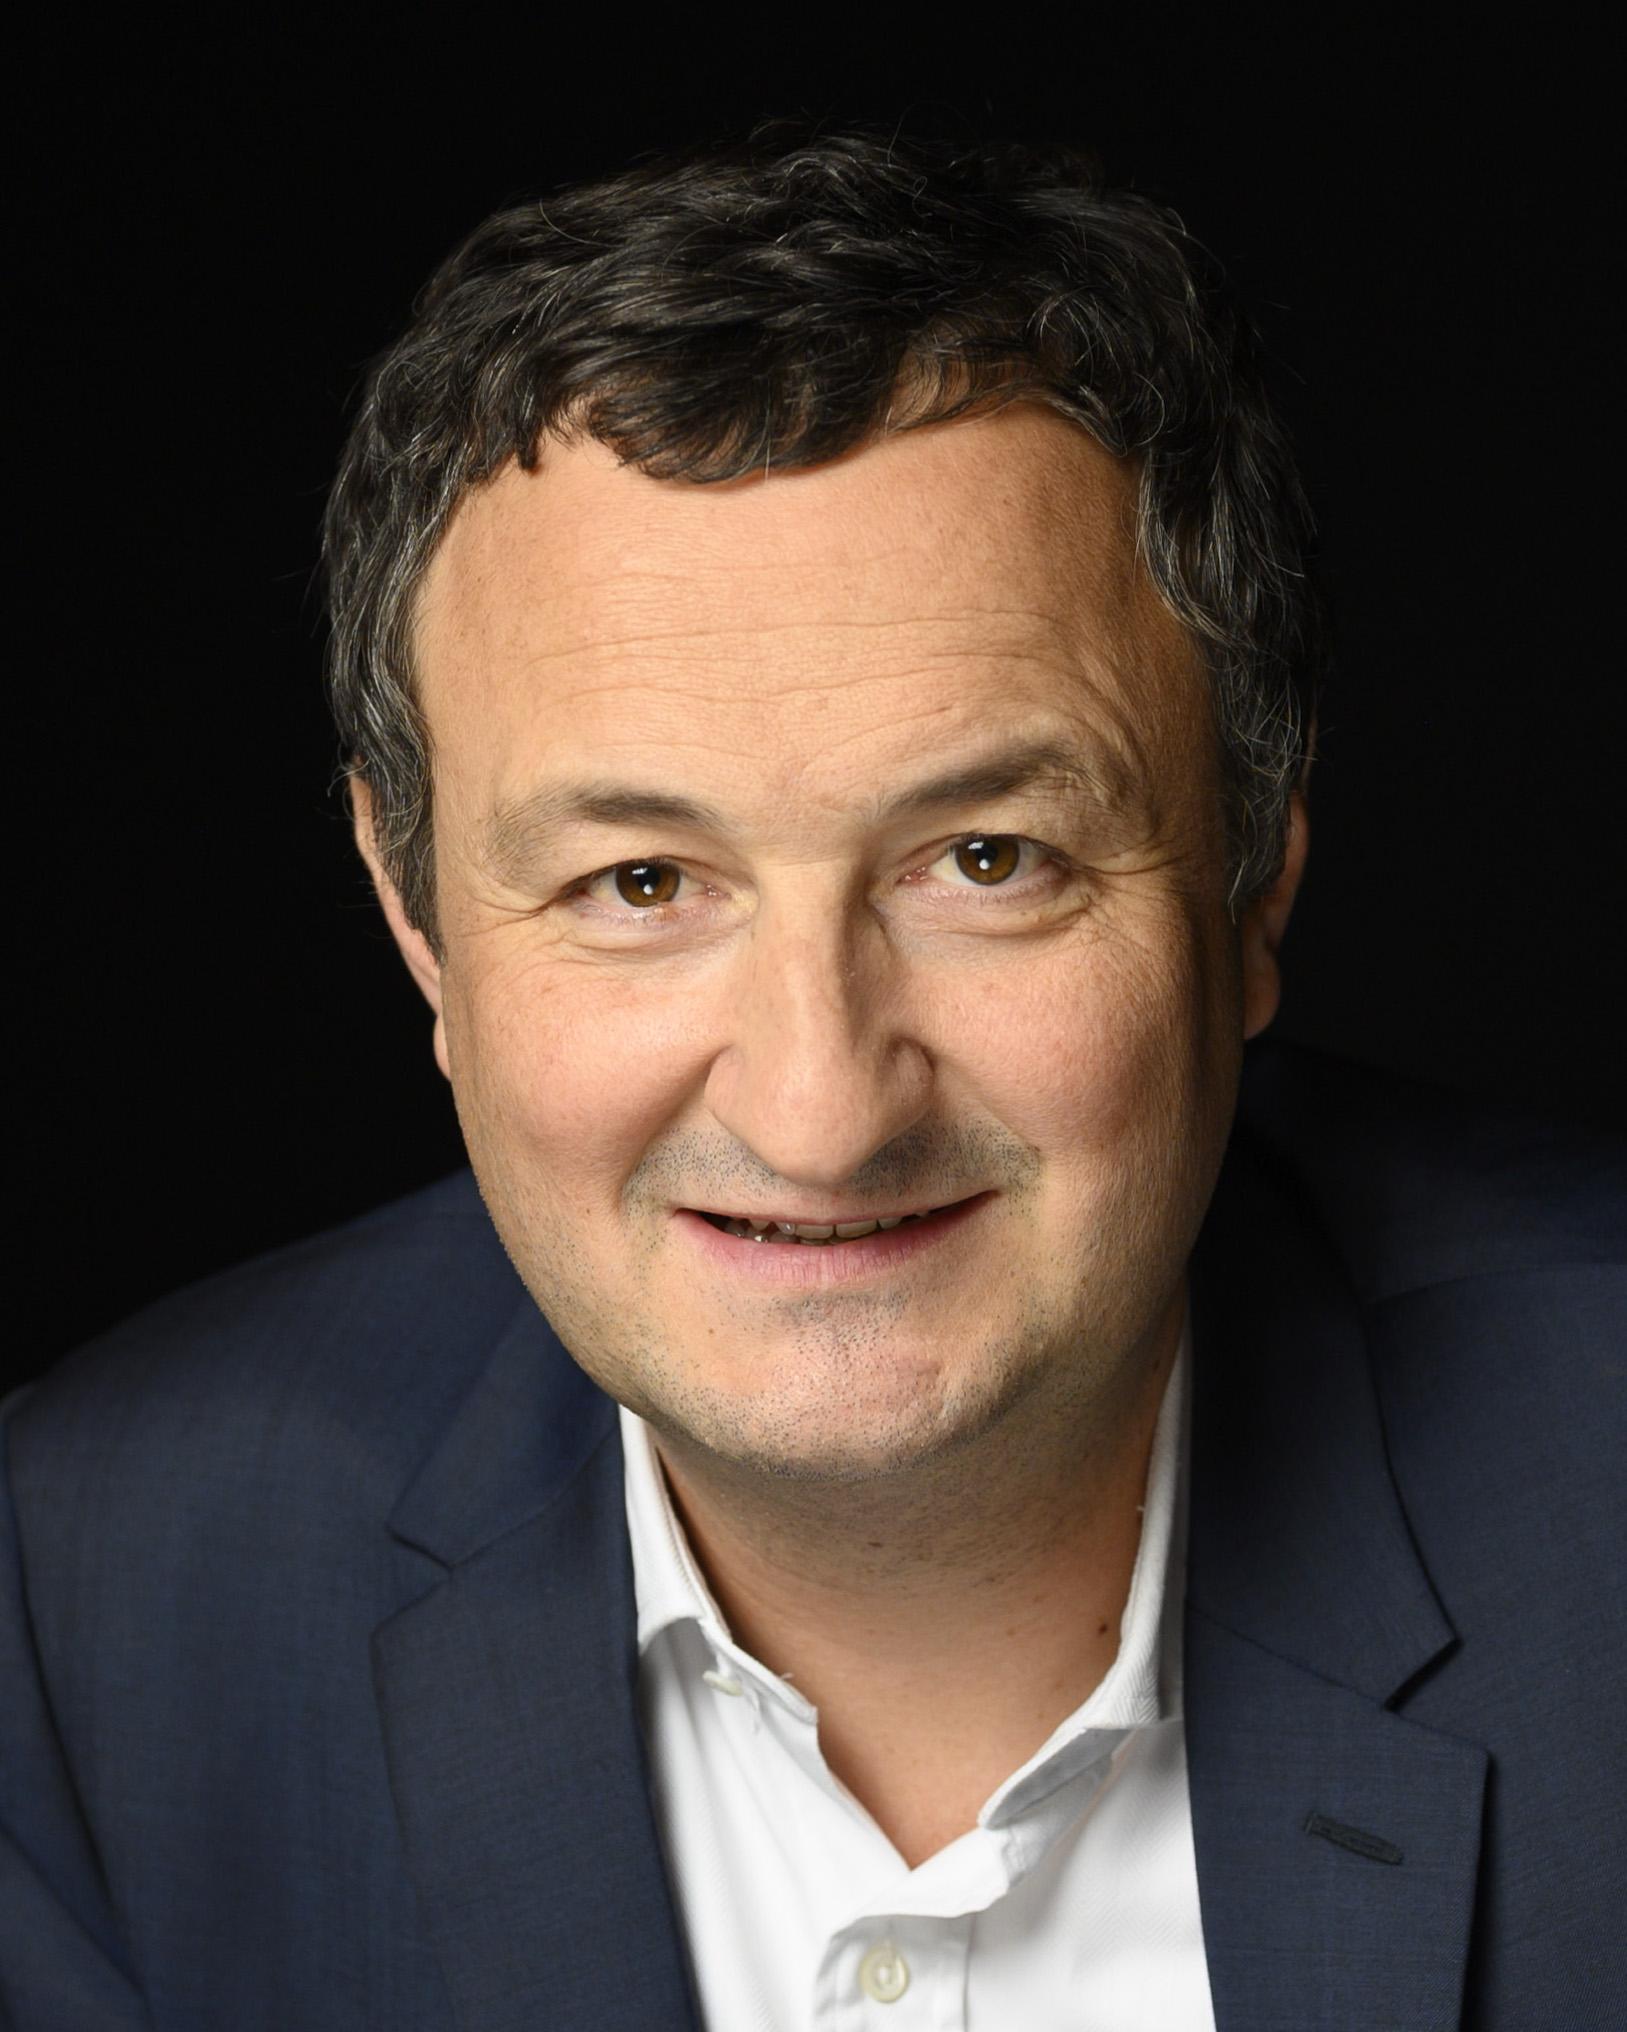 Benoît Grisoni, CEO de Boursorama, en avril 2020